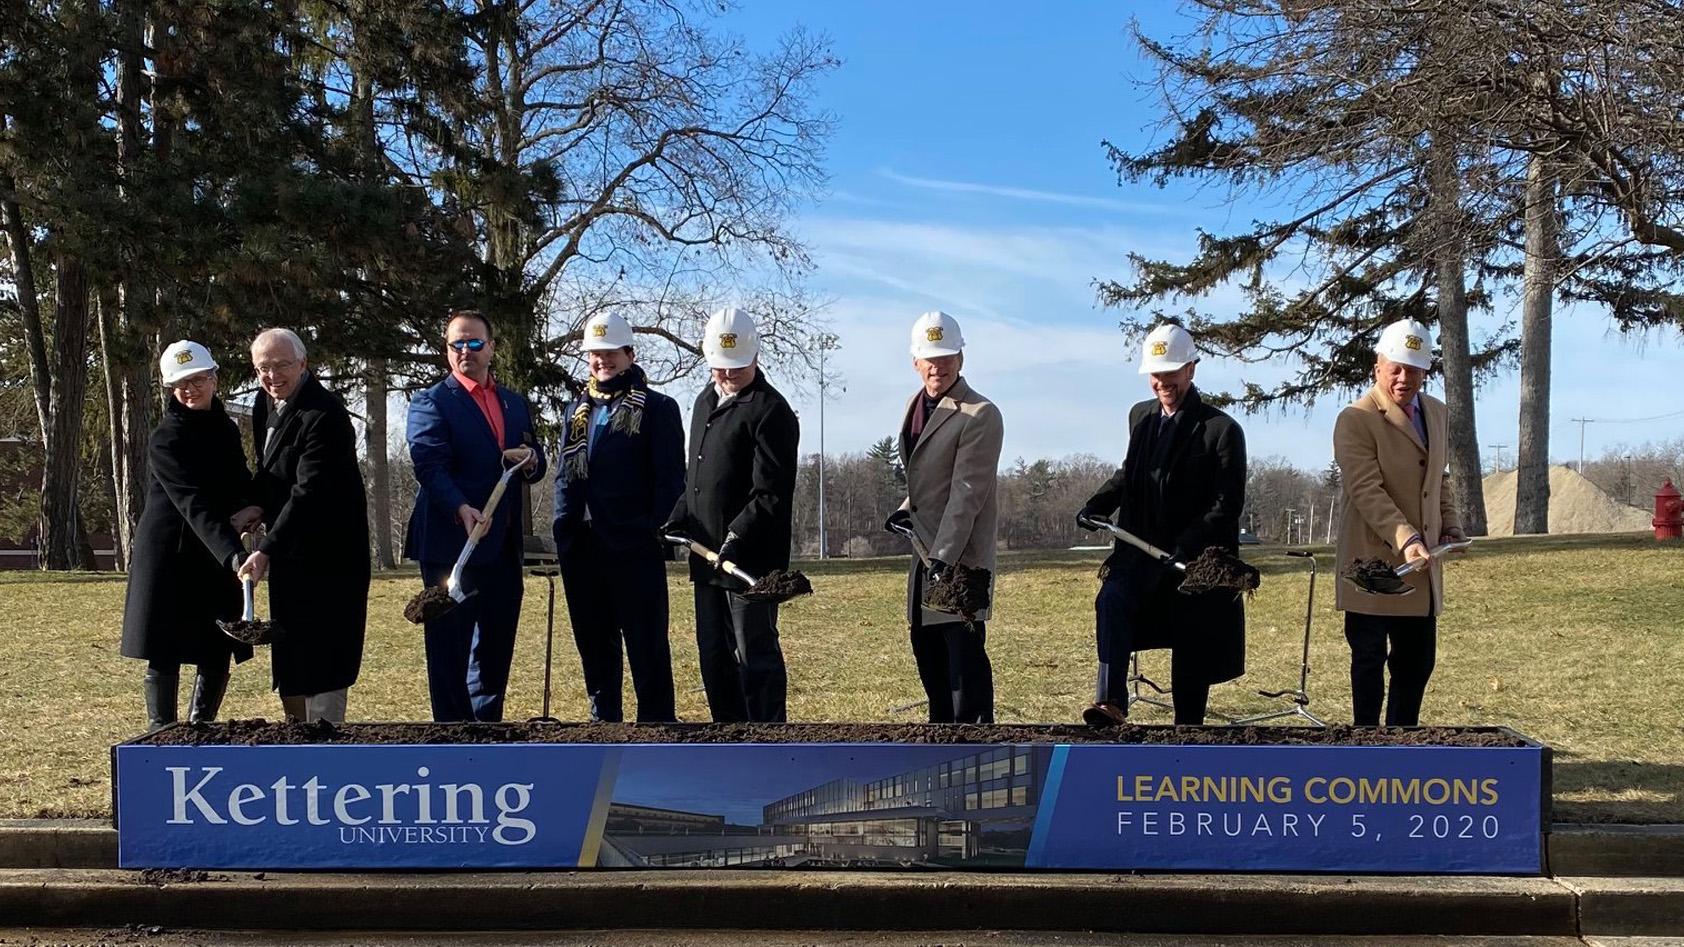 Kettering University ground breaking